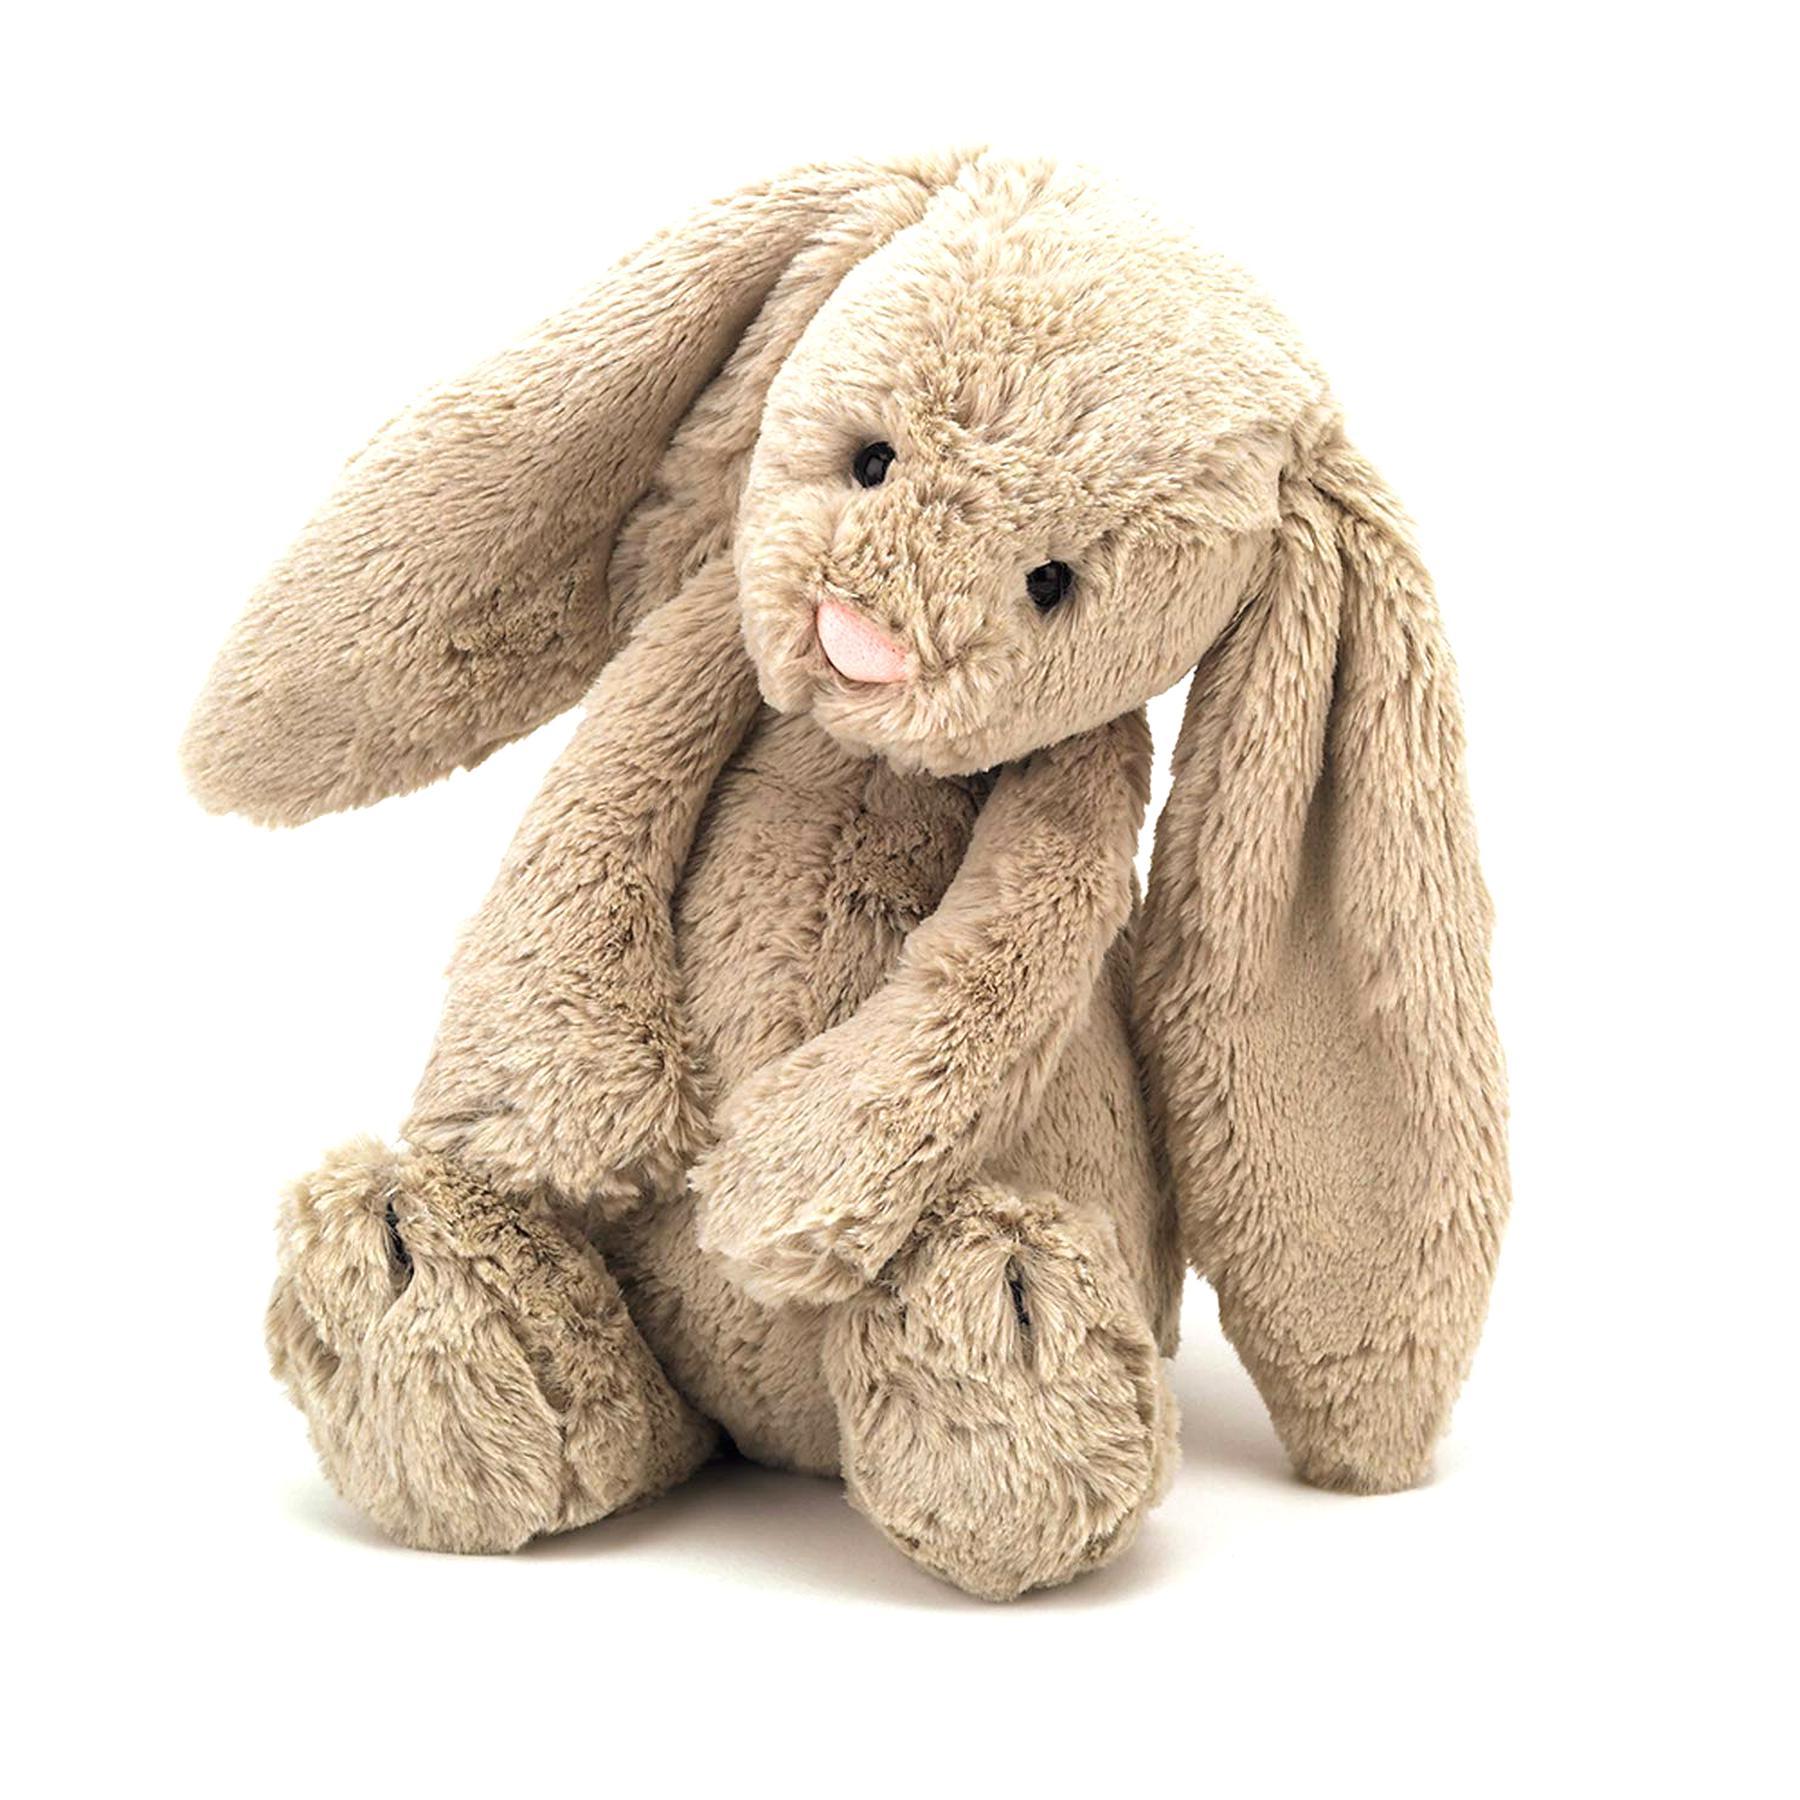 jellycat rabbit for sale